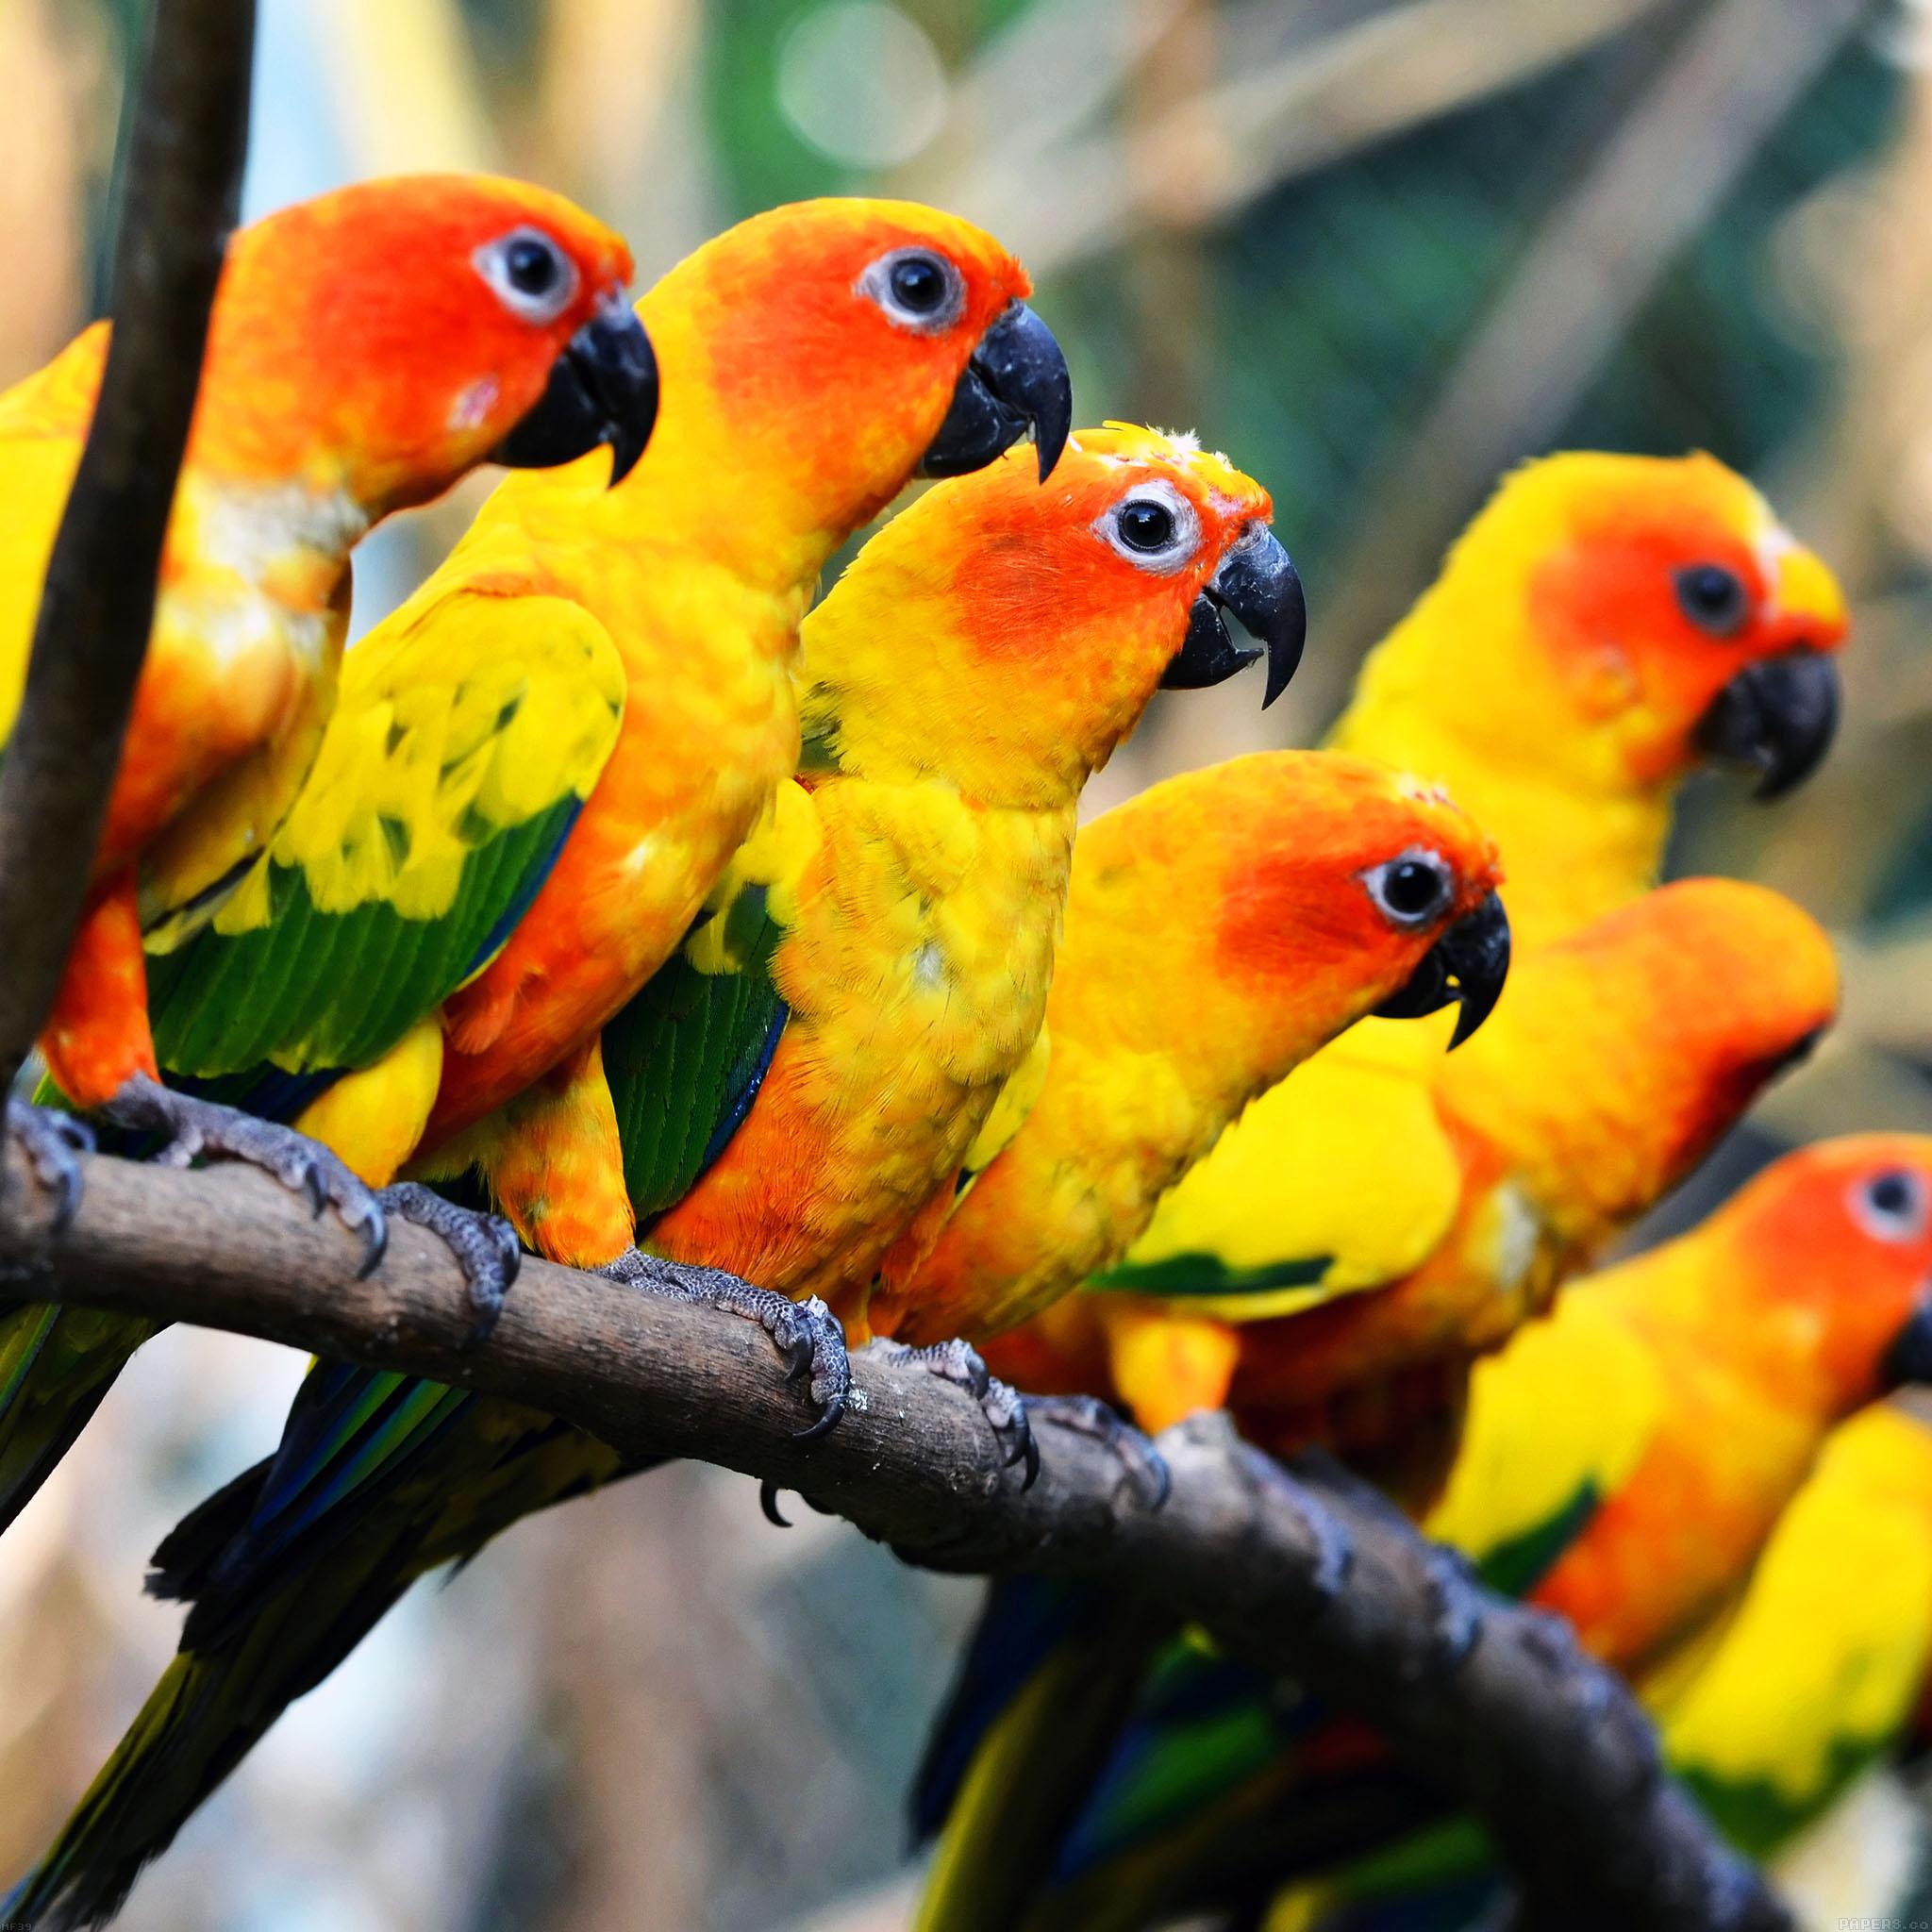 mf39-mocking-bird-family-nature-art